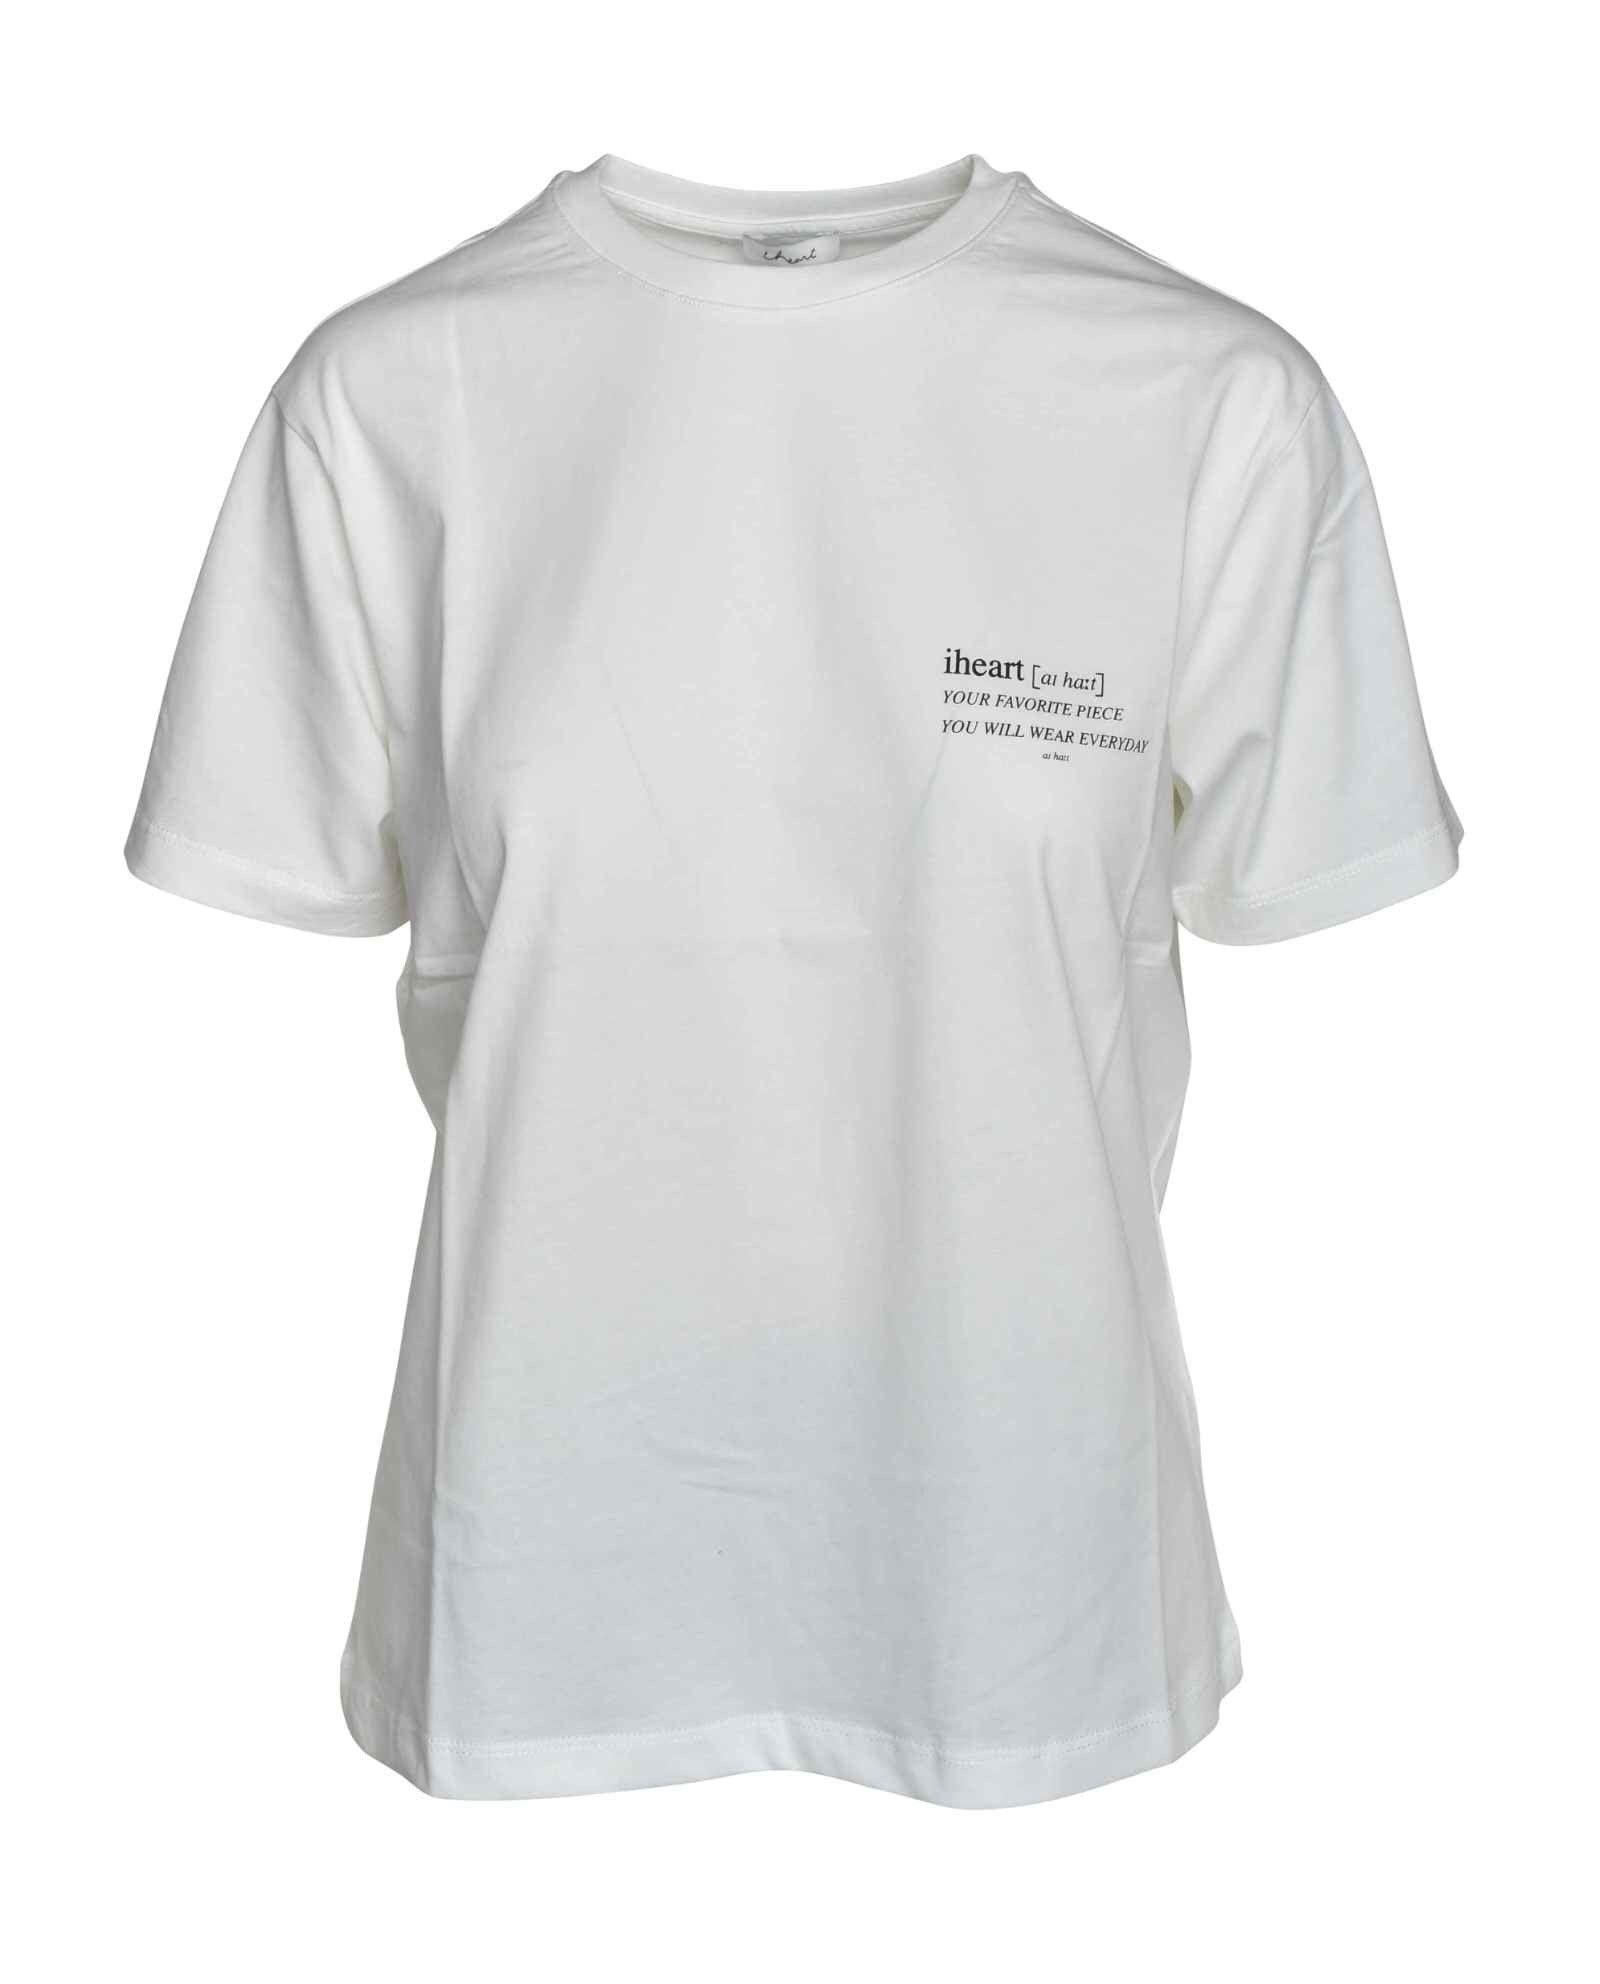 iHEART - Damen Shirt - Dannia - White